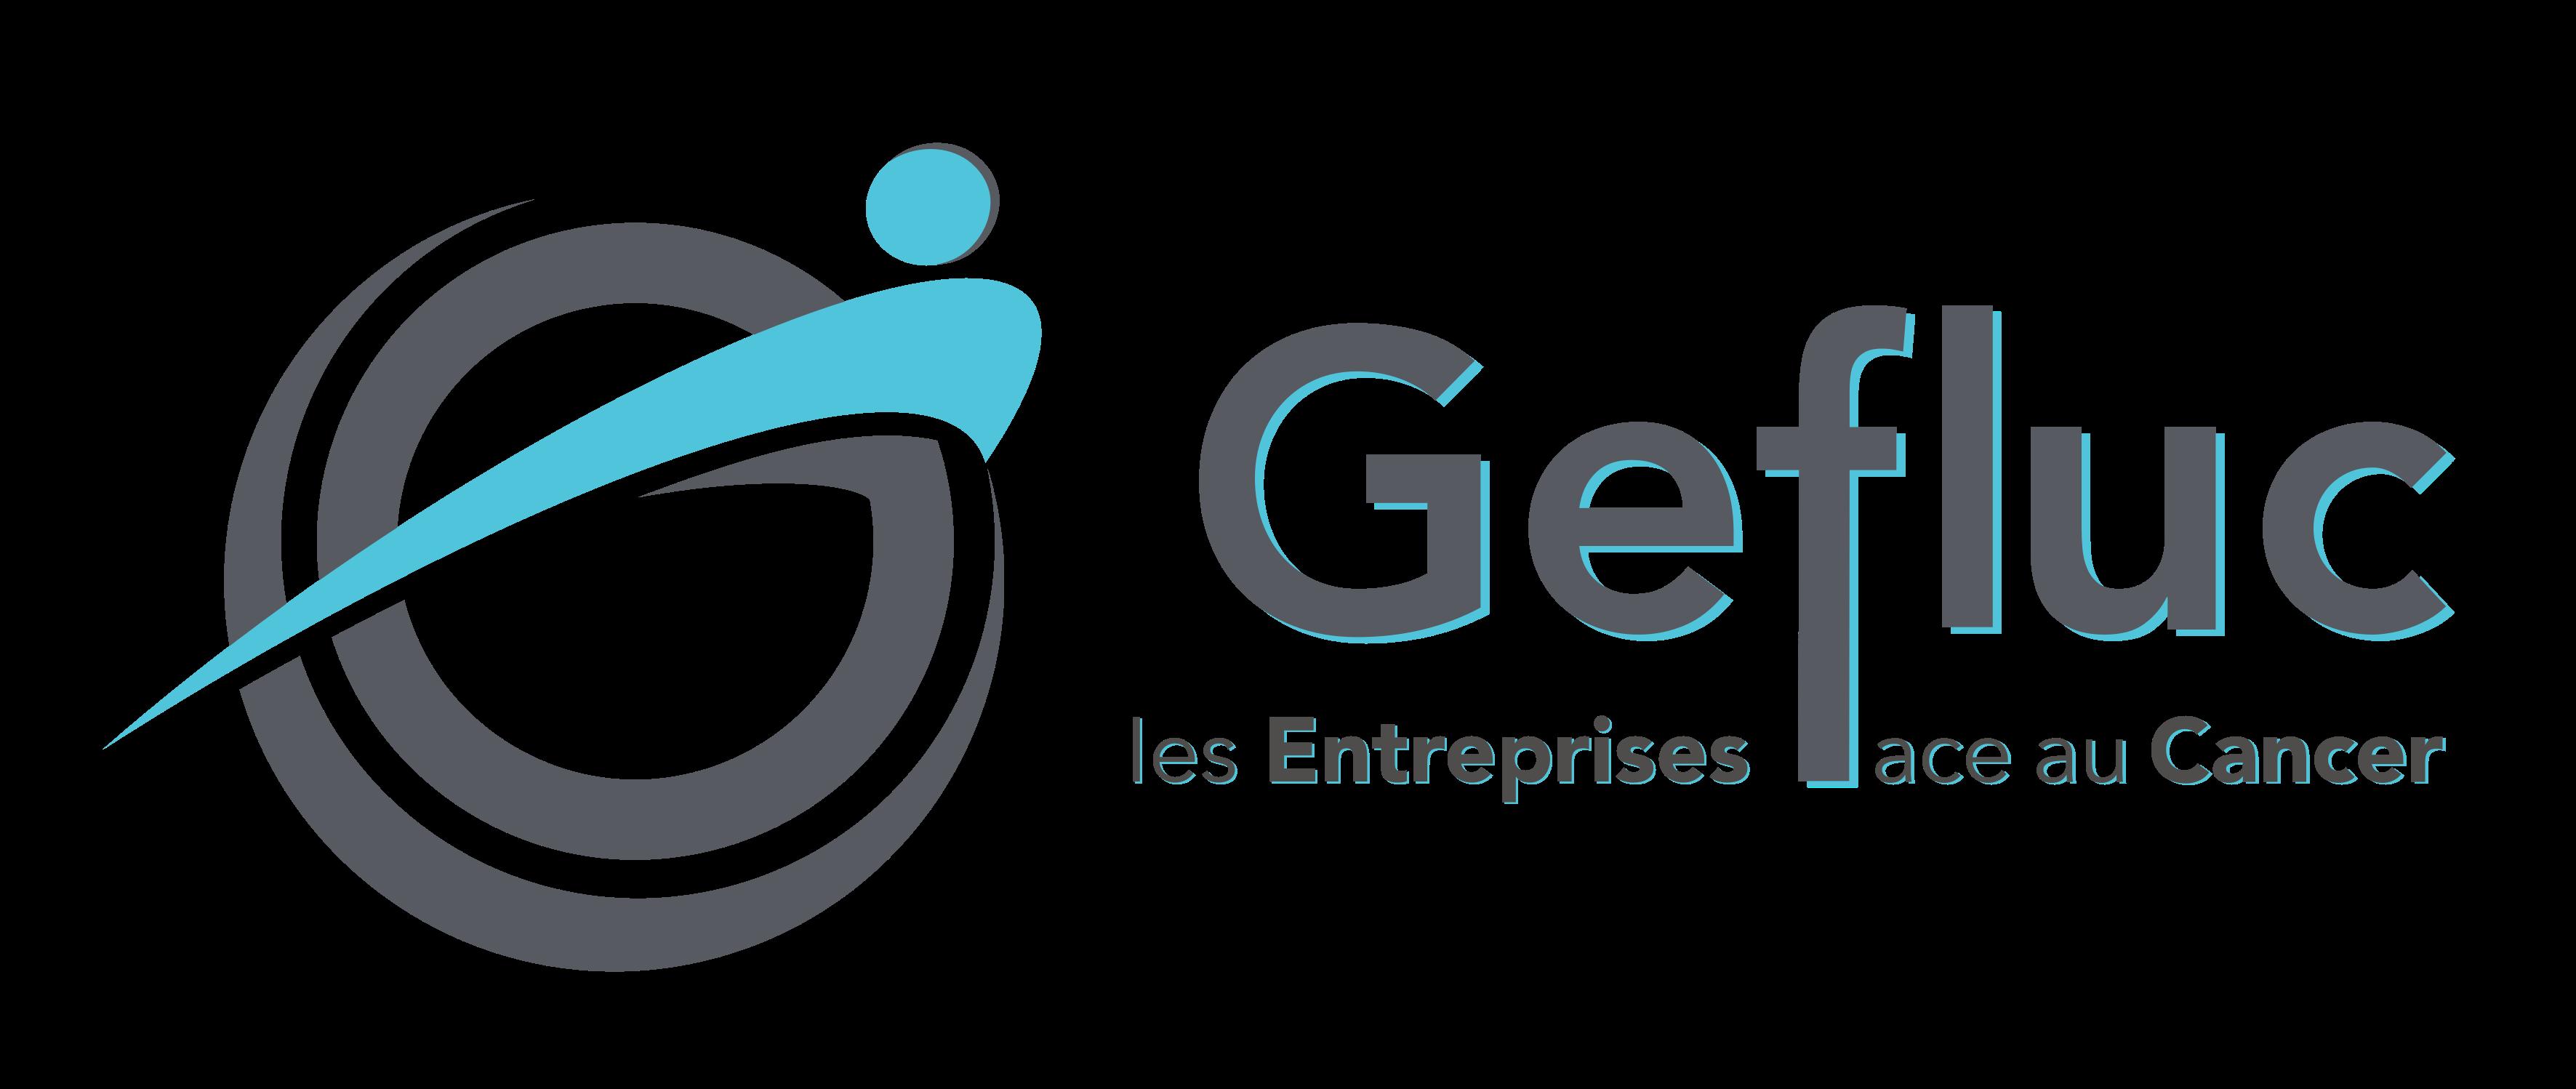 Gefluc Grenoble